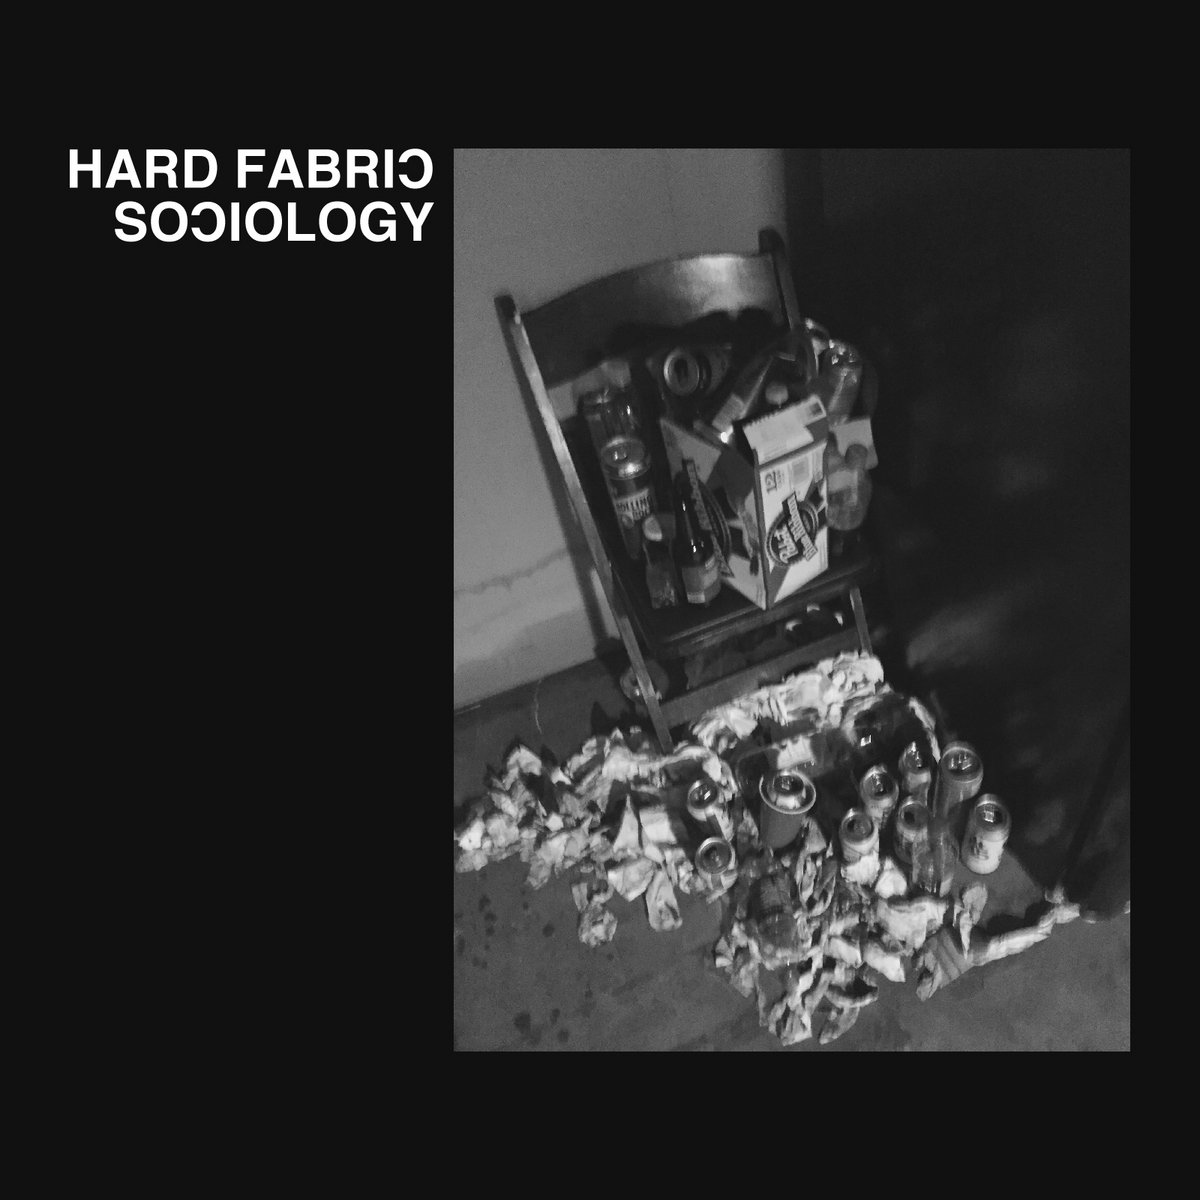 Sociology 2016 Hard Fabric